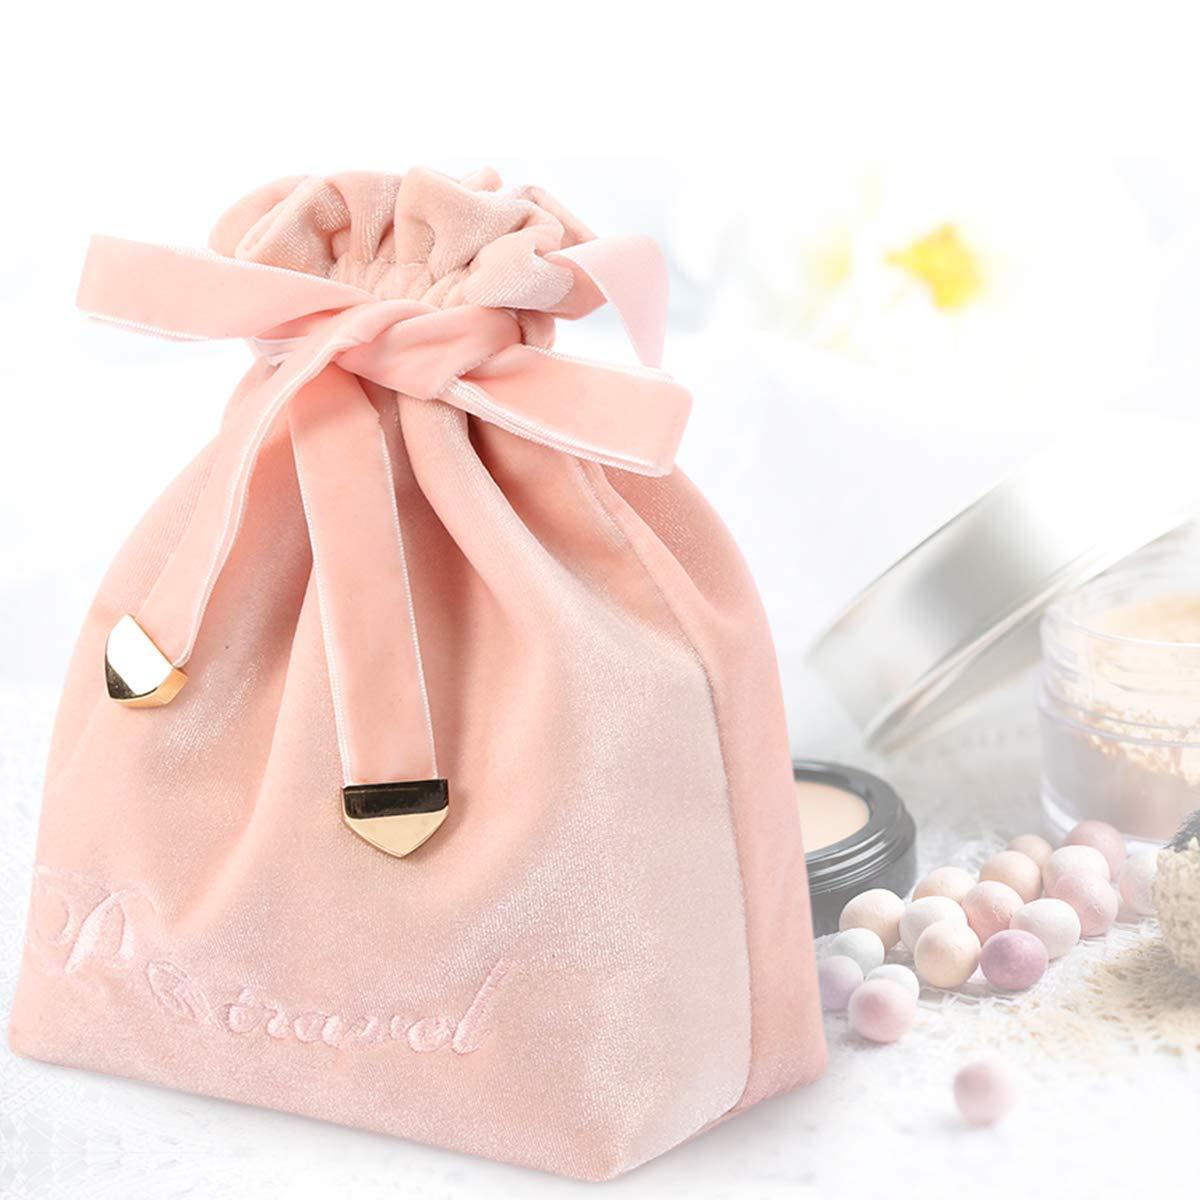 Cosmetic bag travel bag, large capacity portable cosmetic bag, lazy cosmetic bag storage bag can hold toiletries